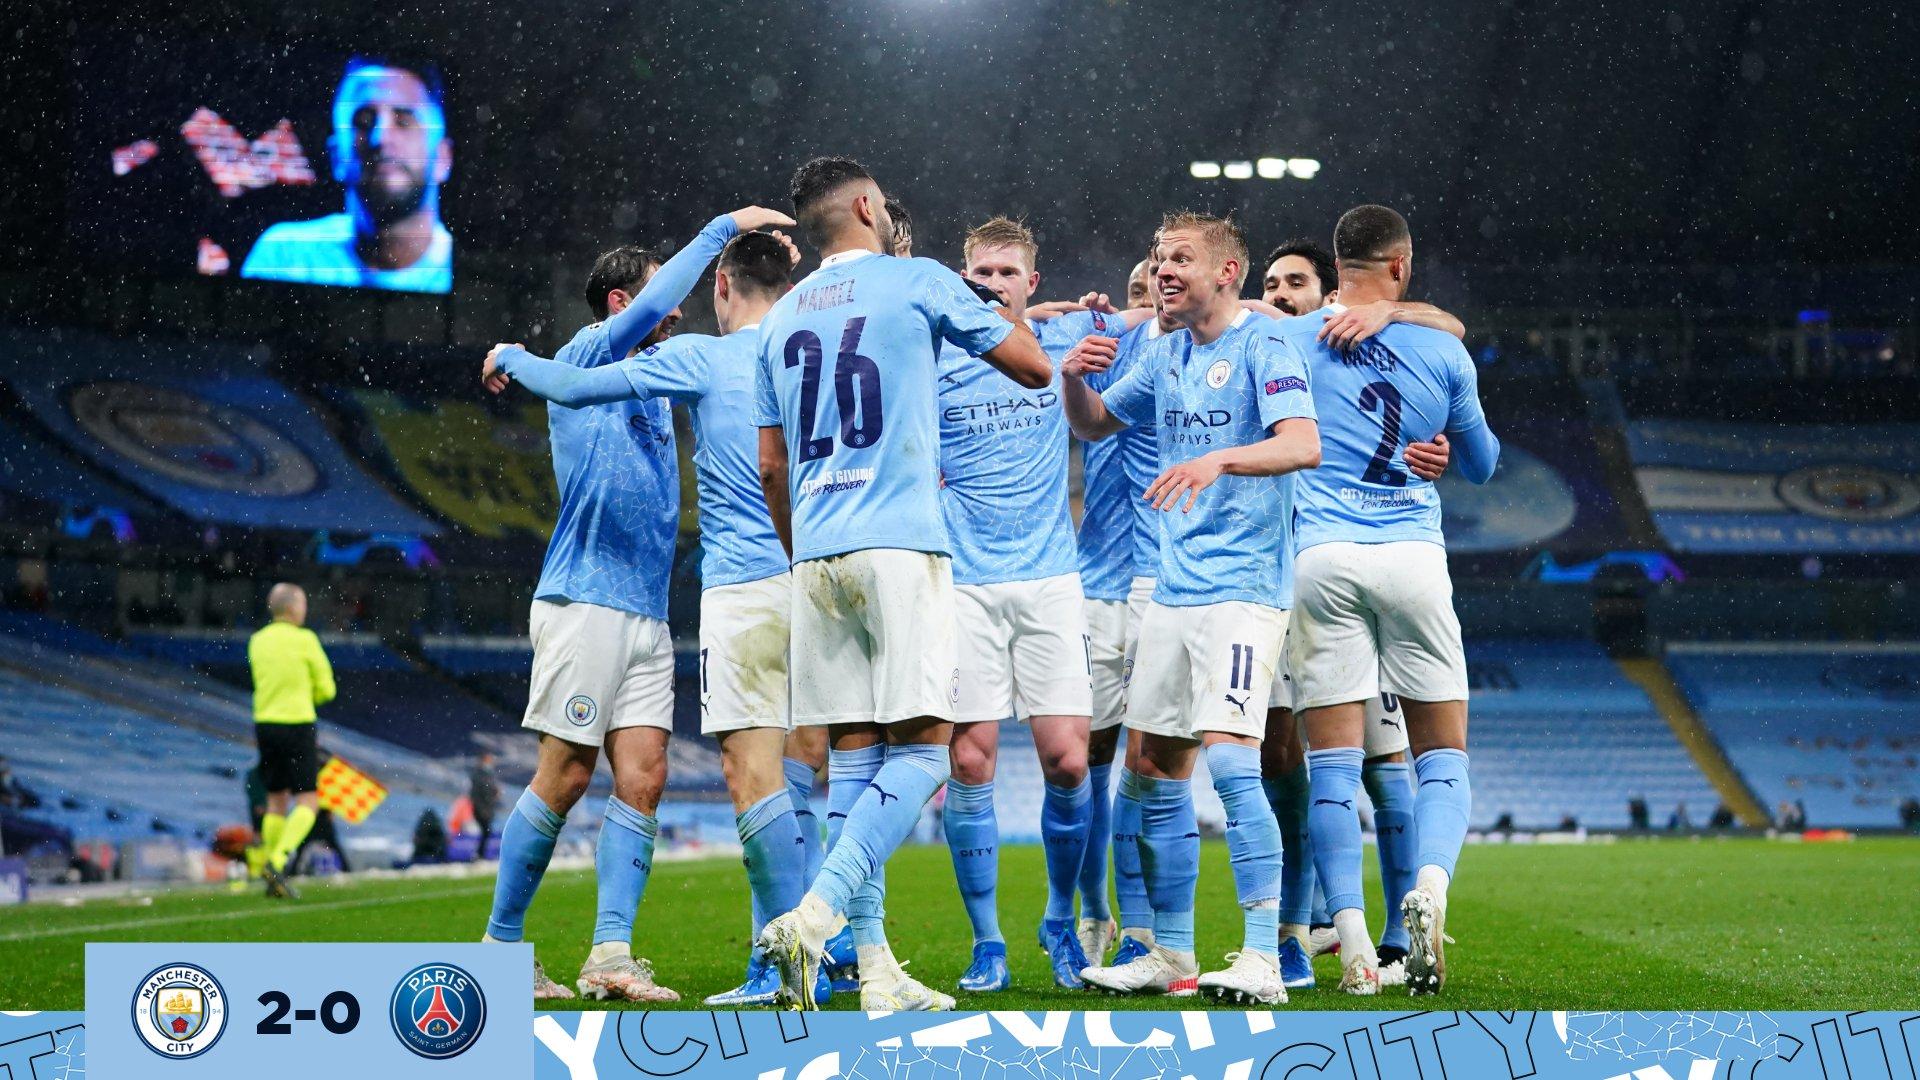 Manchester City [PHOTO CREDIT: @ChampionsLeague]